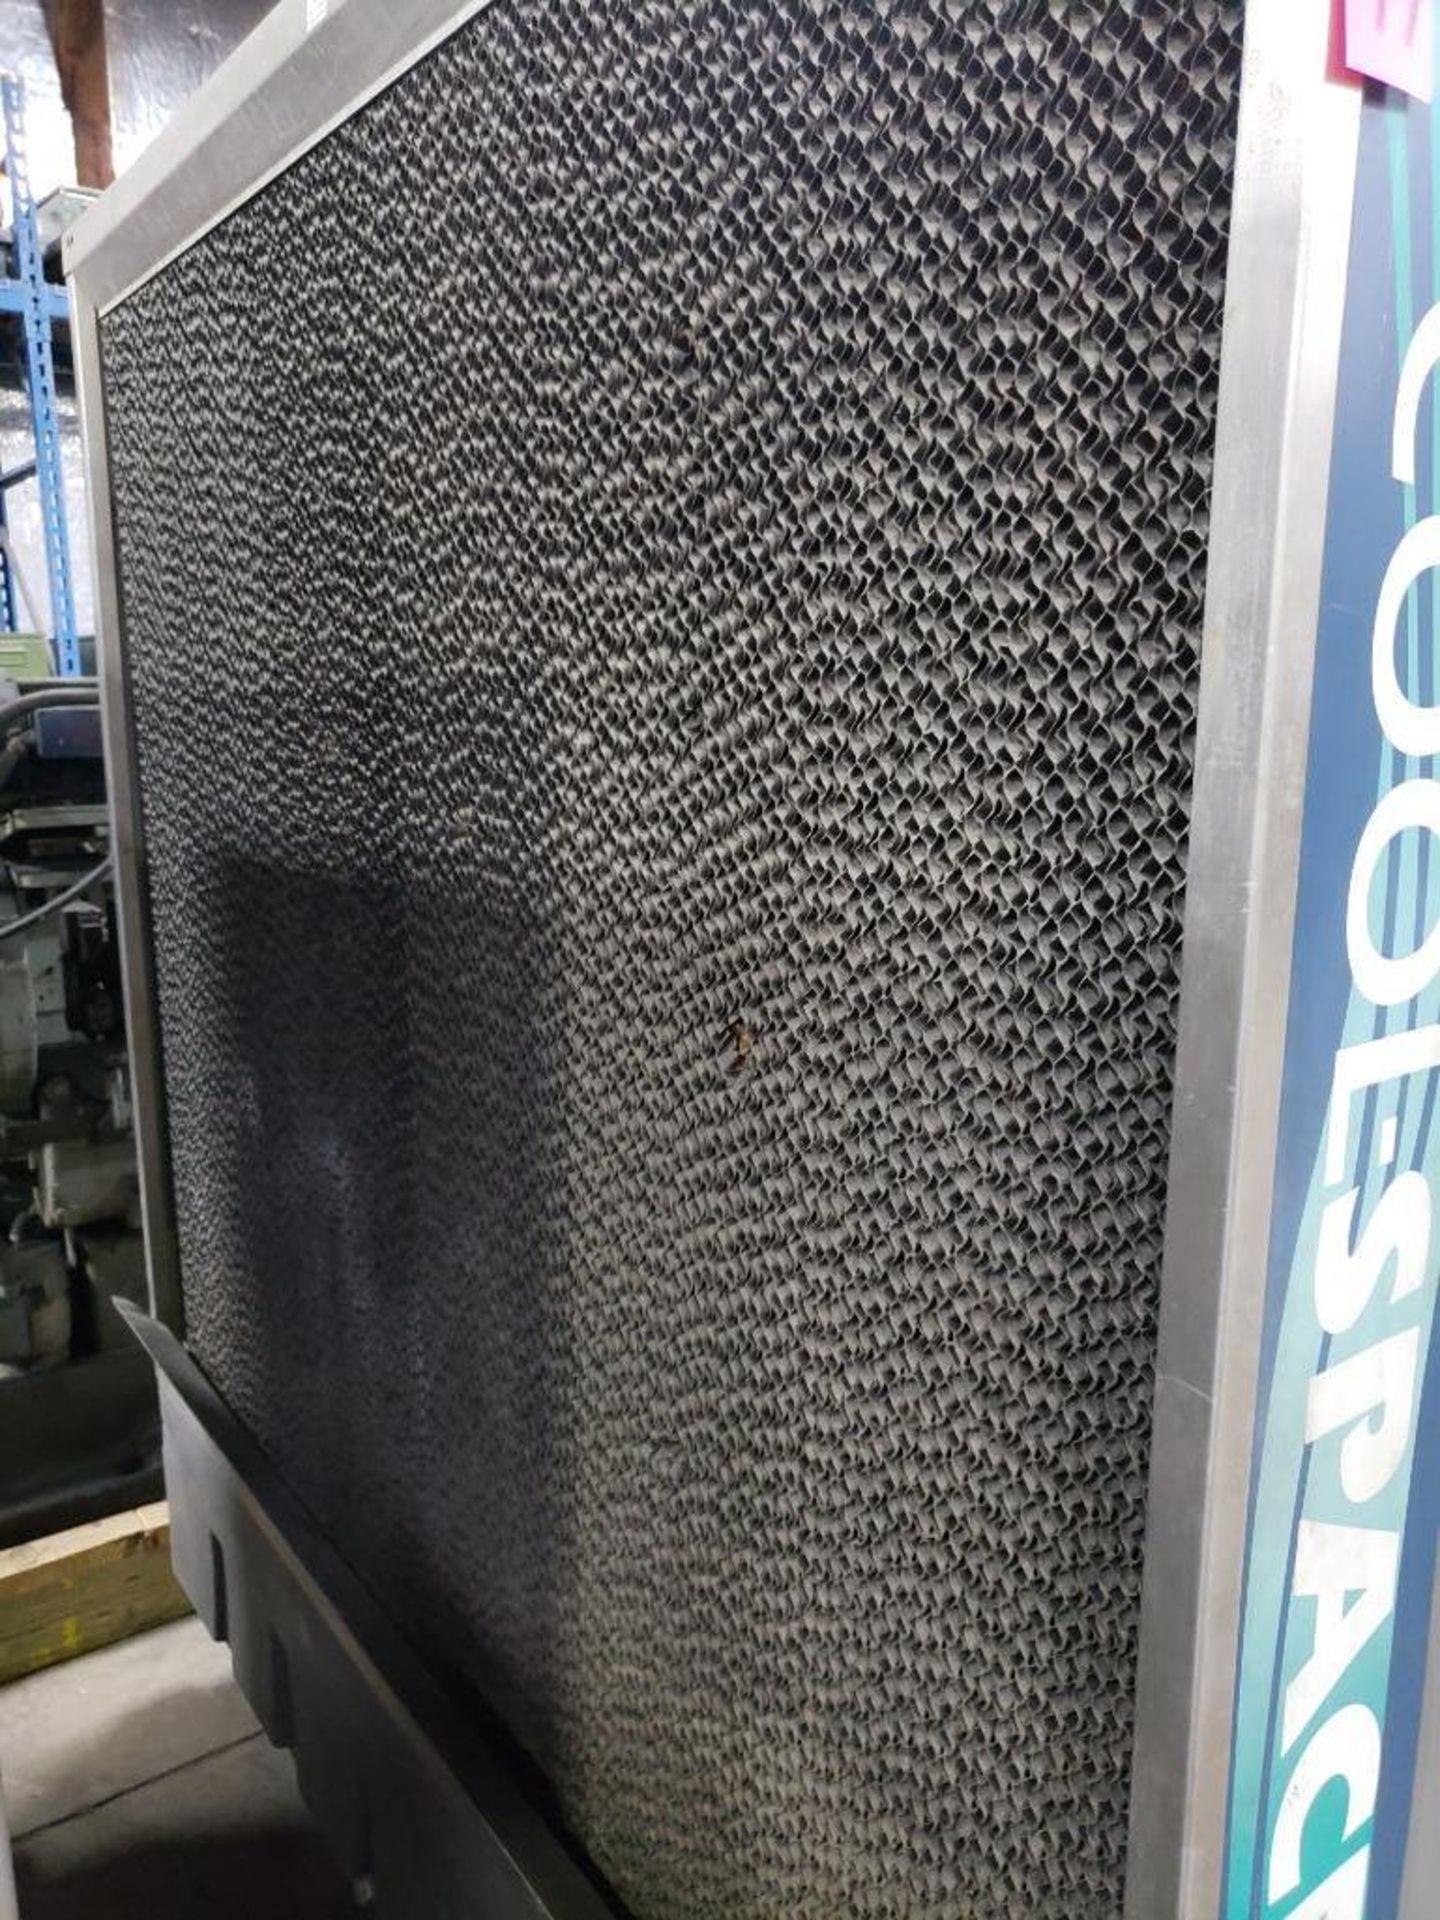 Lot 77 - Cool space portable evaporative cooler model CS5-48-2B. single phase 115v. Mfg Date 08/12.